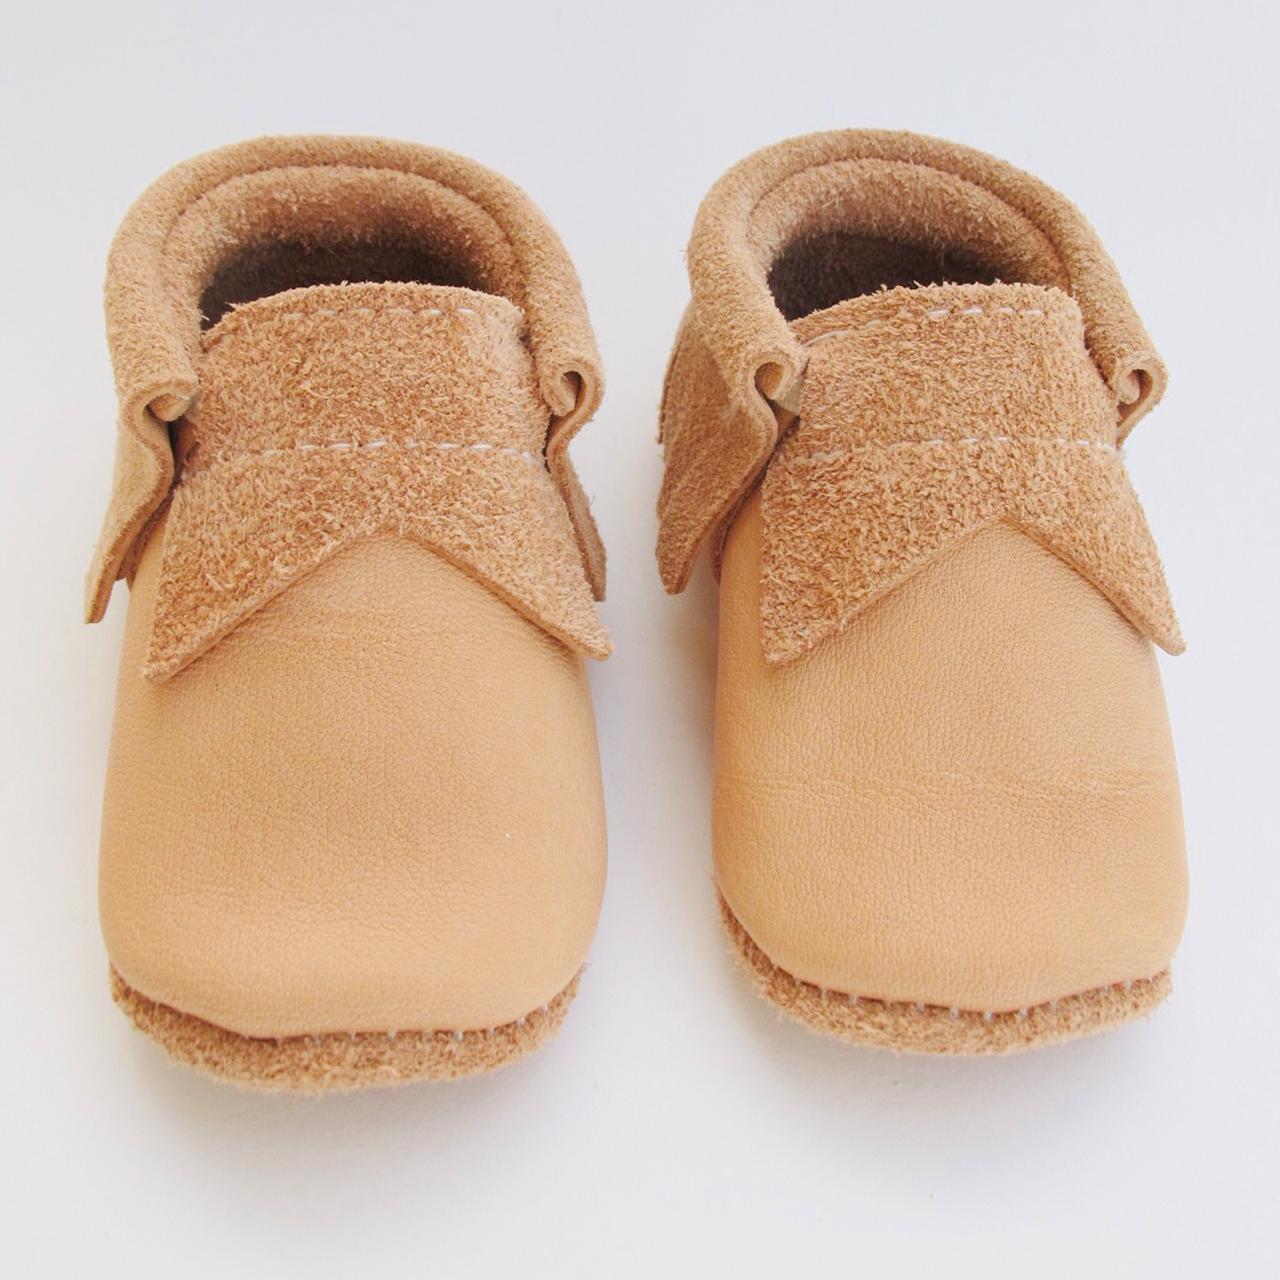 Petit Mai Decke ICE Moccasins Sand Muetze Yeti Pacci Clip Camel Geschenk Set ICE